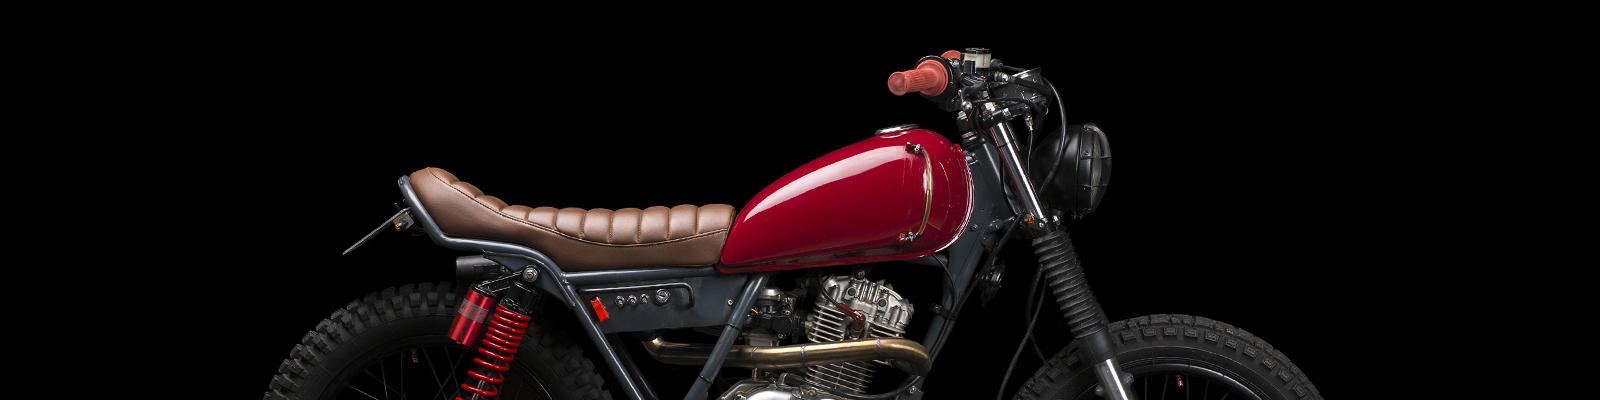 moto suzuki gn 125 scrambler cafe racer préparation ATELIER MEDUSA